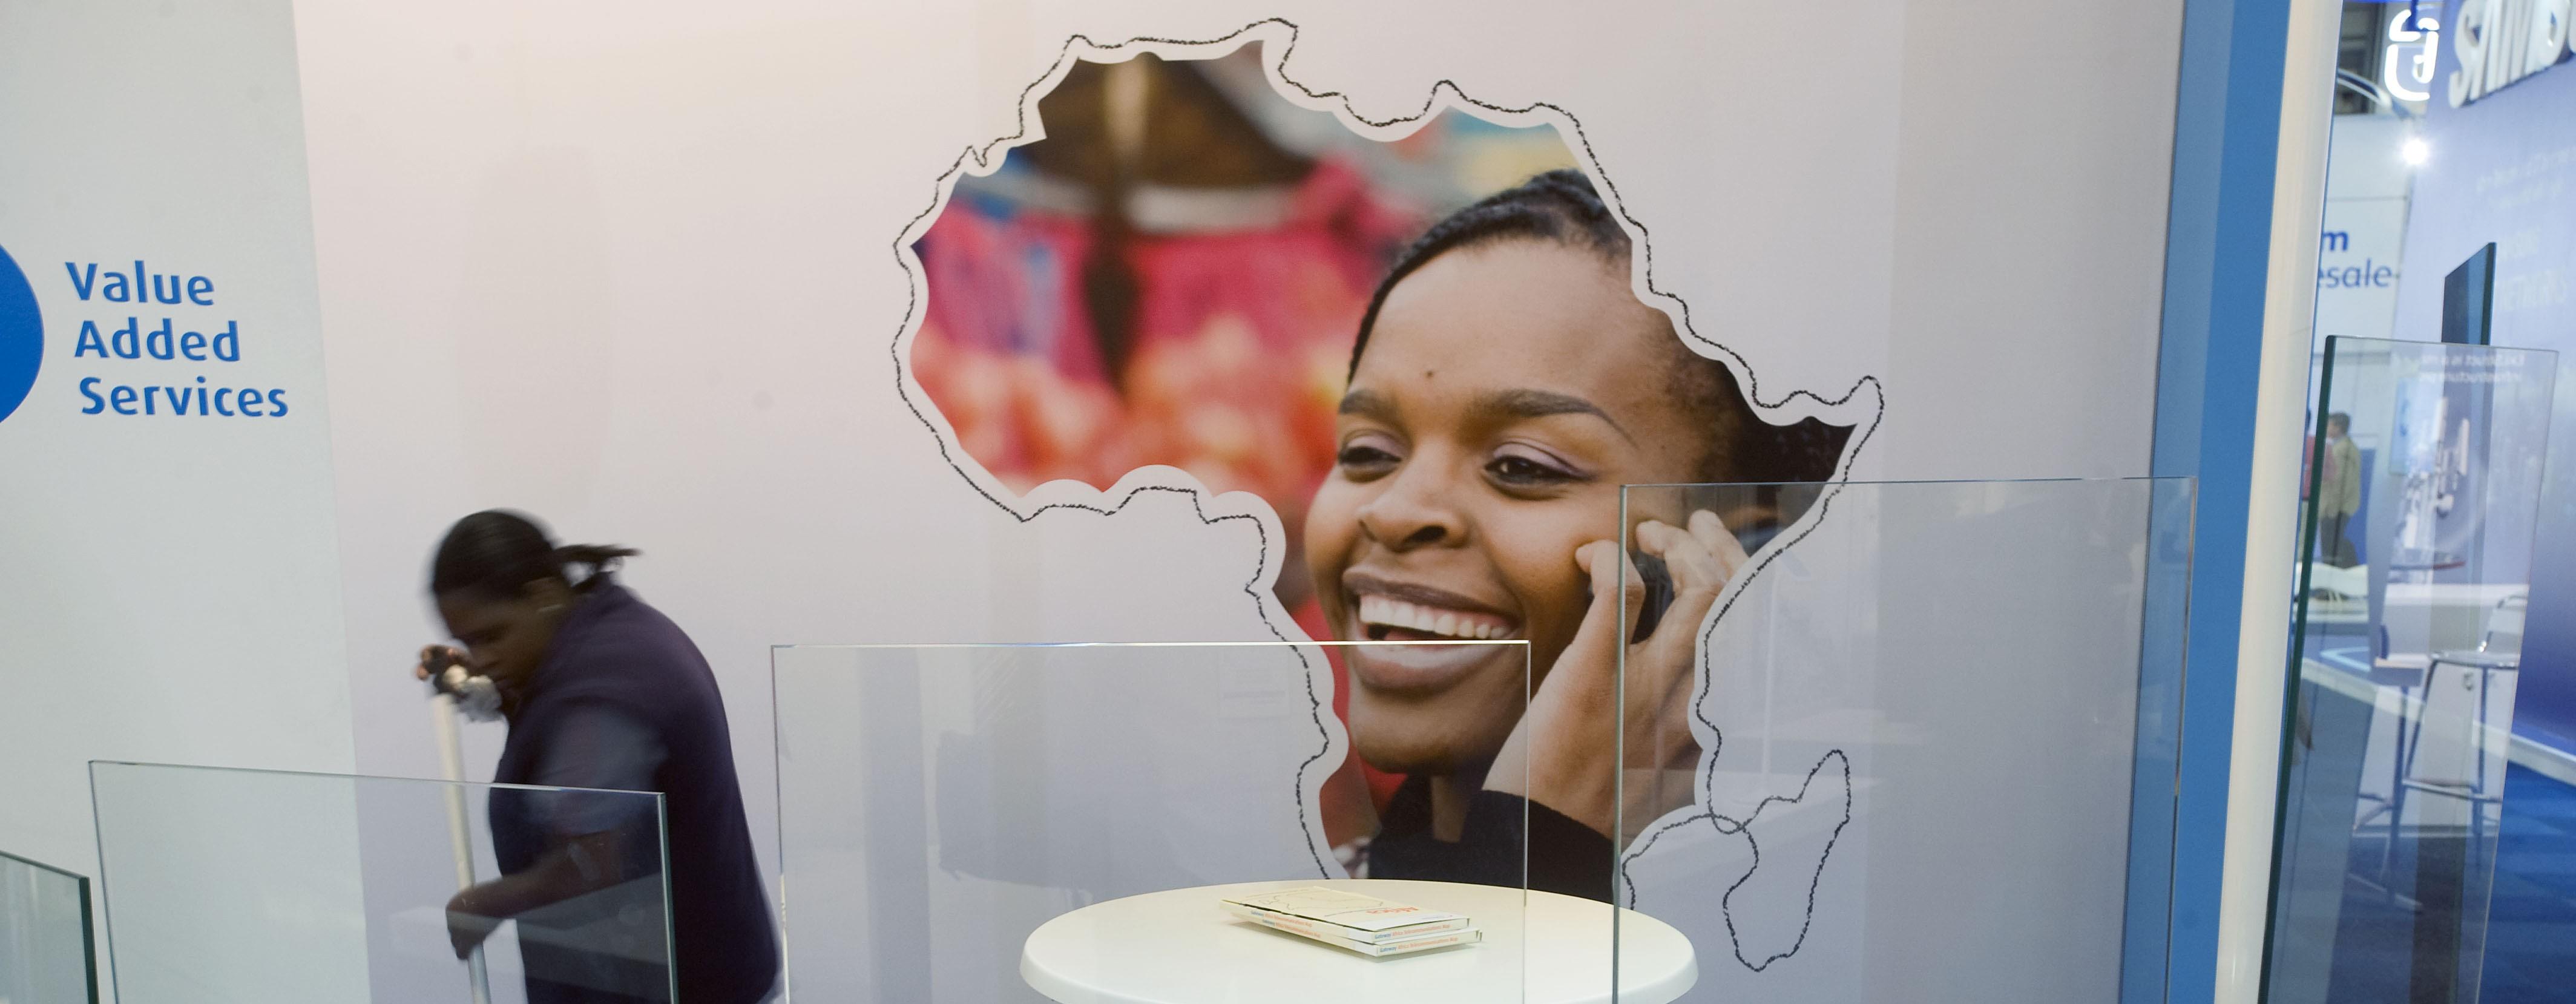 SAFRICA-AFRICA-IT-TELECOM-MEDIA-SAFRICA